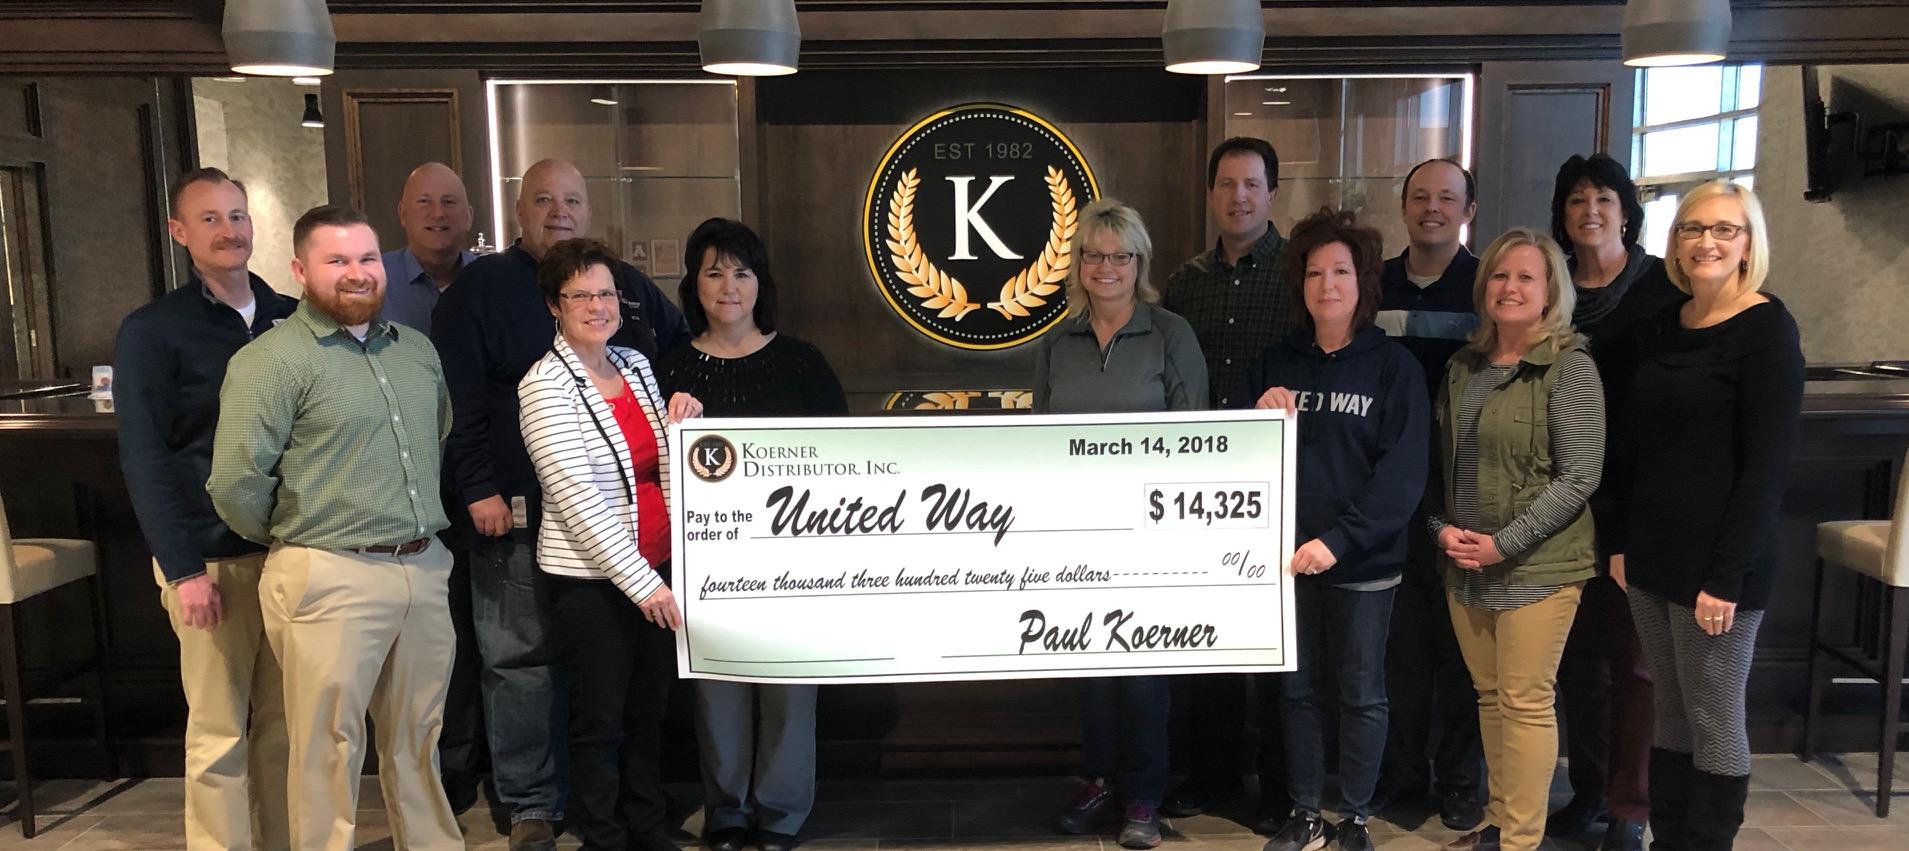 Koerner Distributor, Inc. Donates to United Way of Effingham County